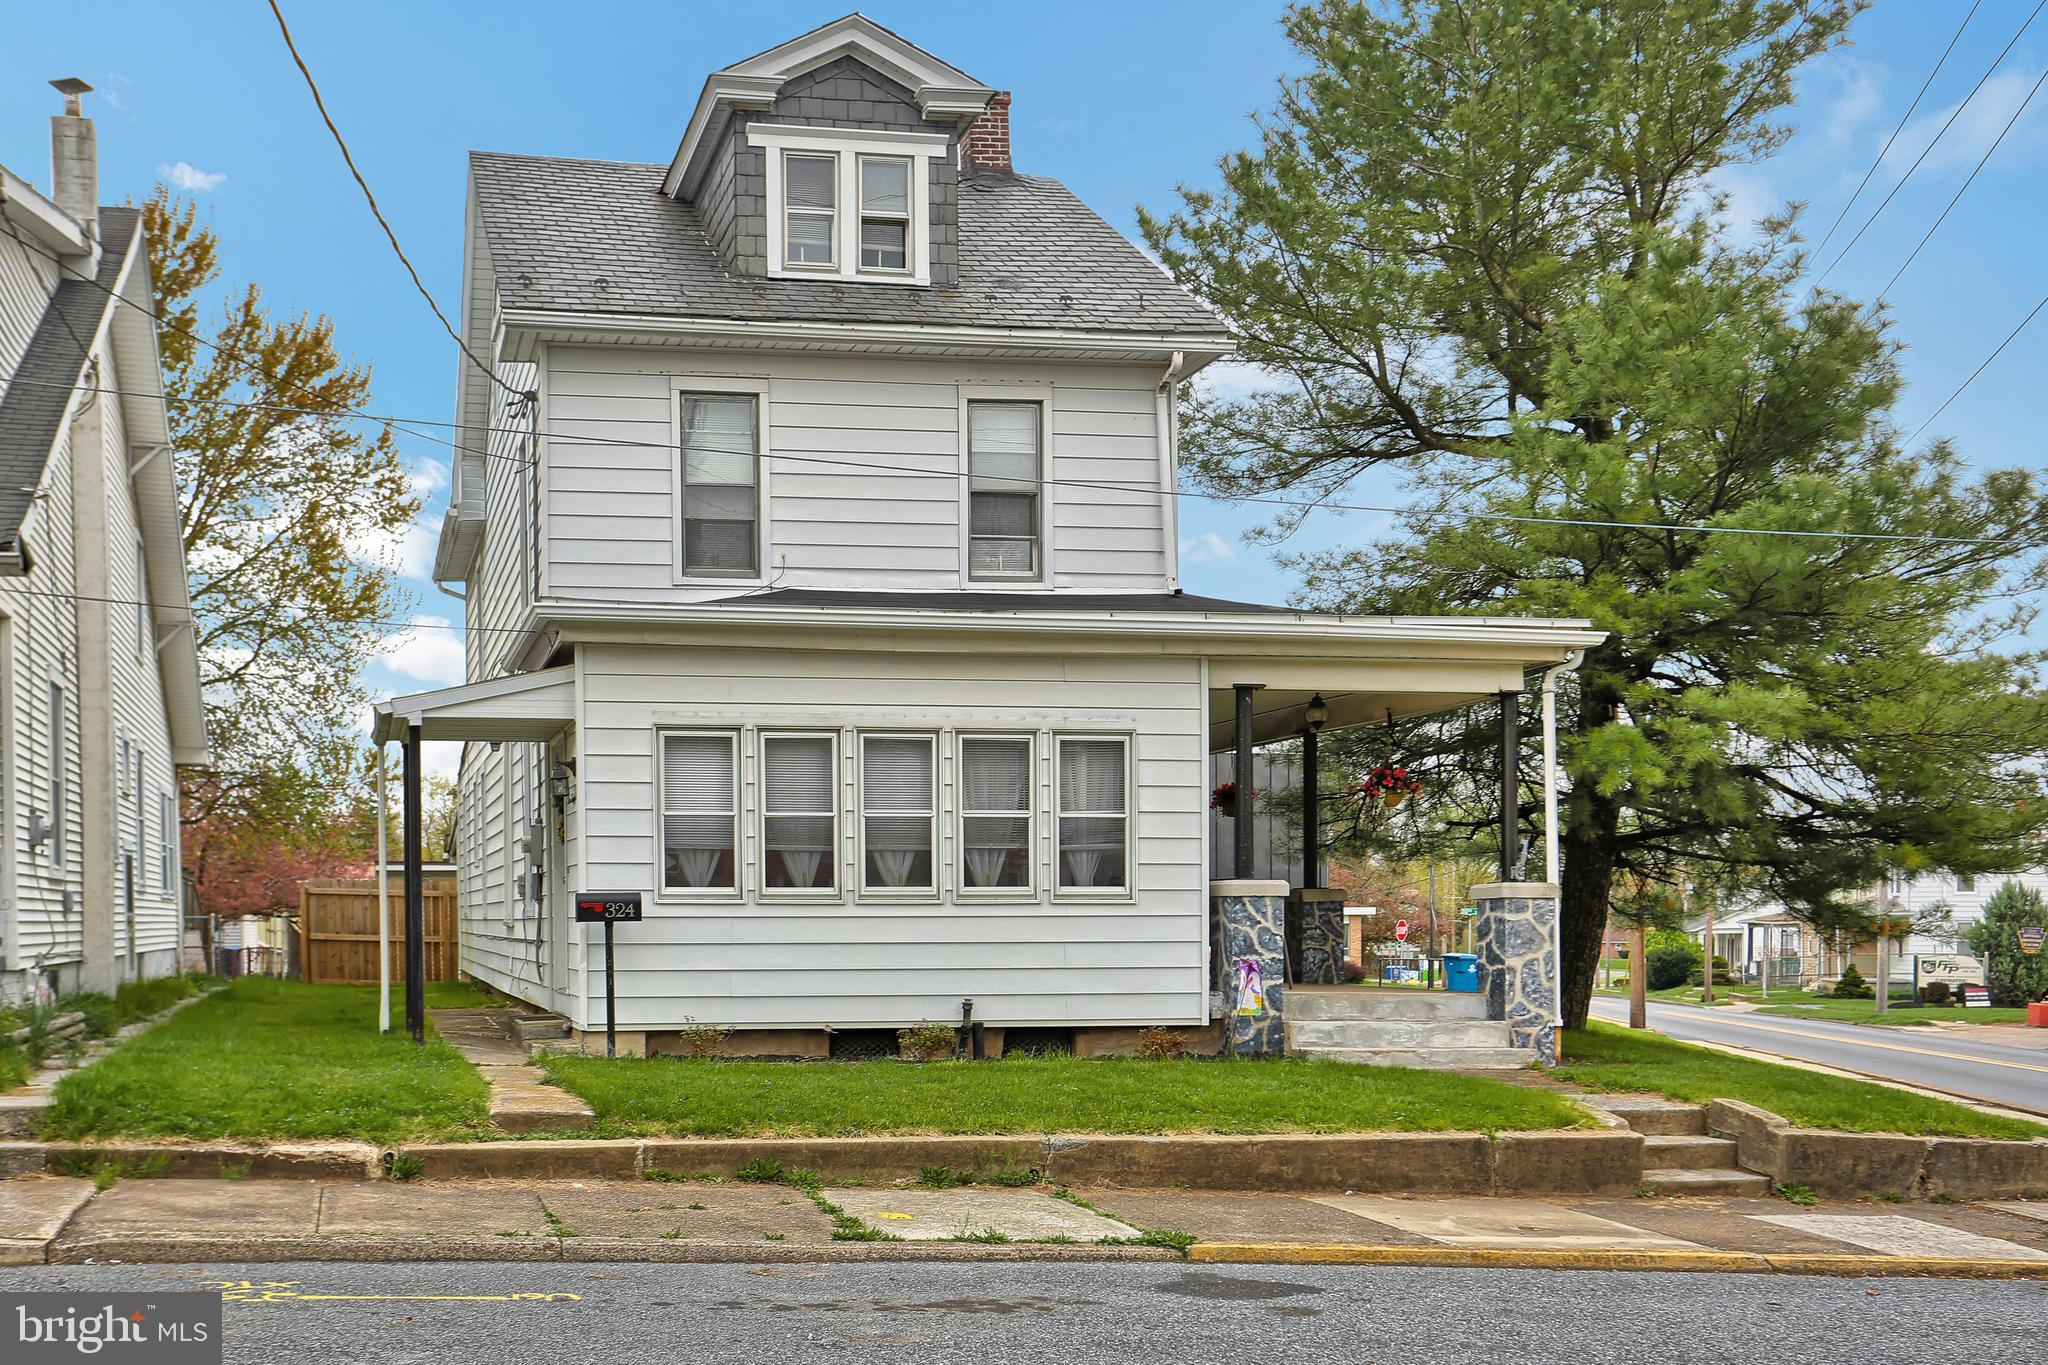 324 S 29TH STREET, HARRISBURG, PA 17103